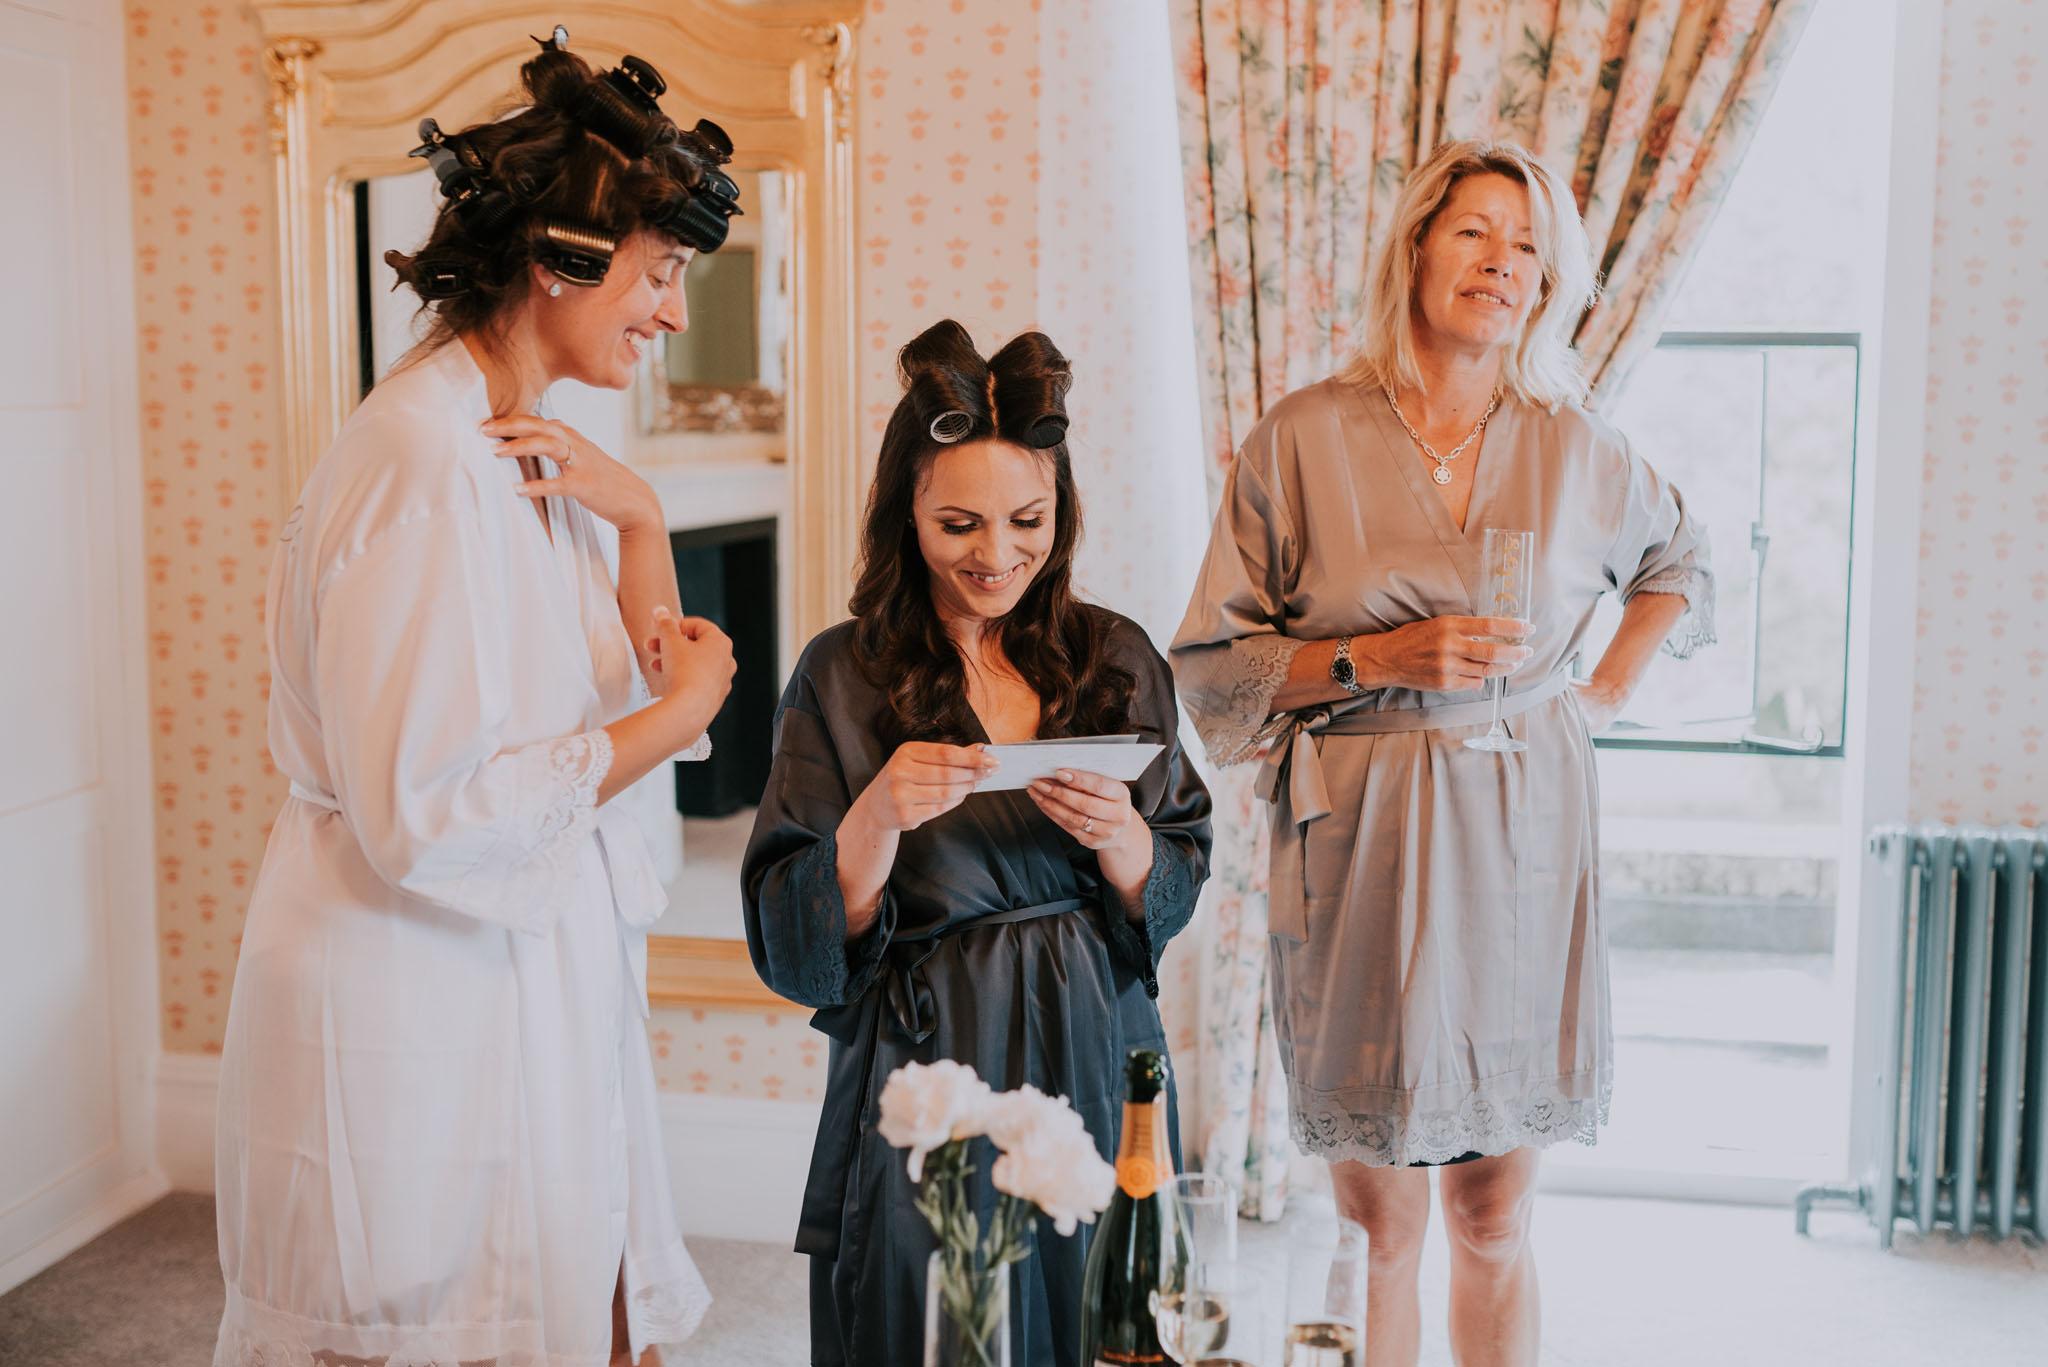 wedding-photographer-glewstone-court-hereford-scott-stockwell-photography035.jpg